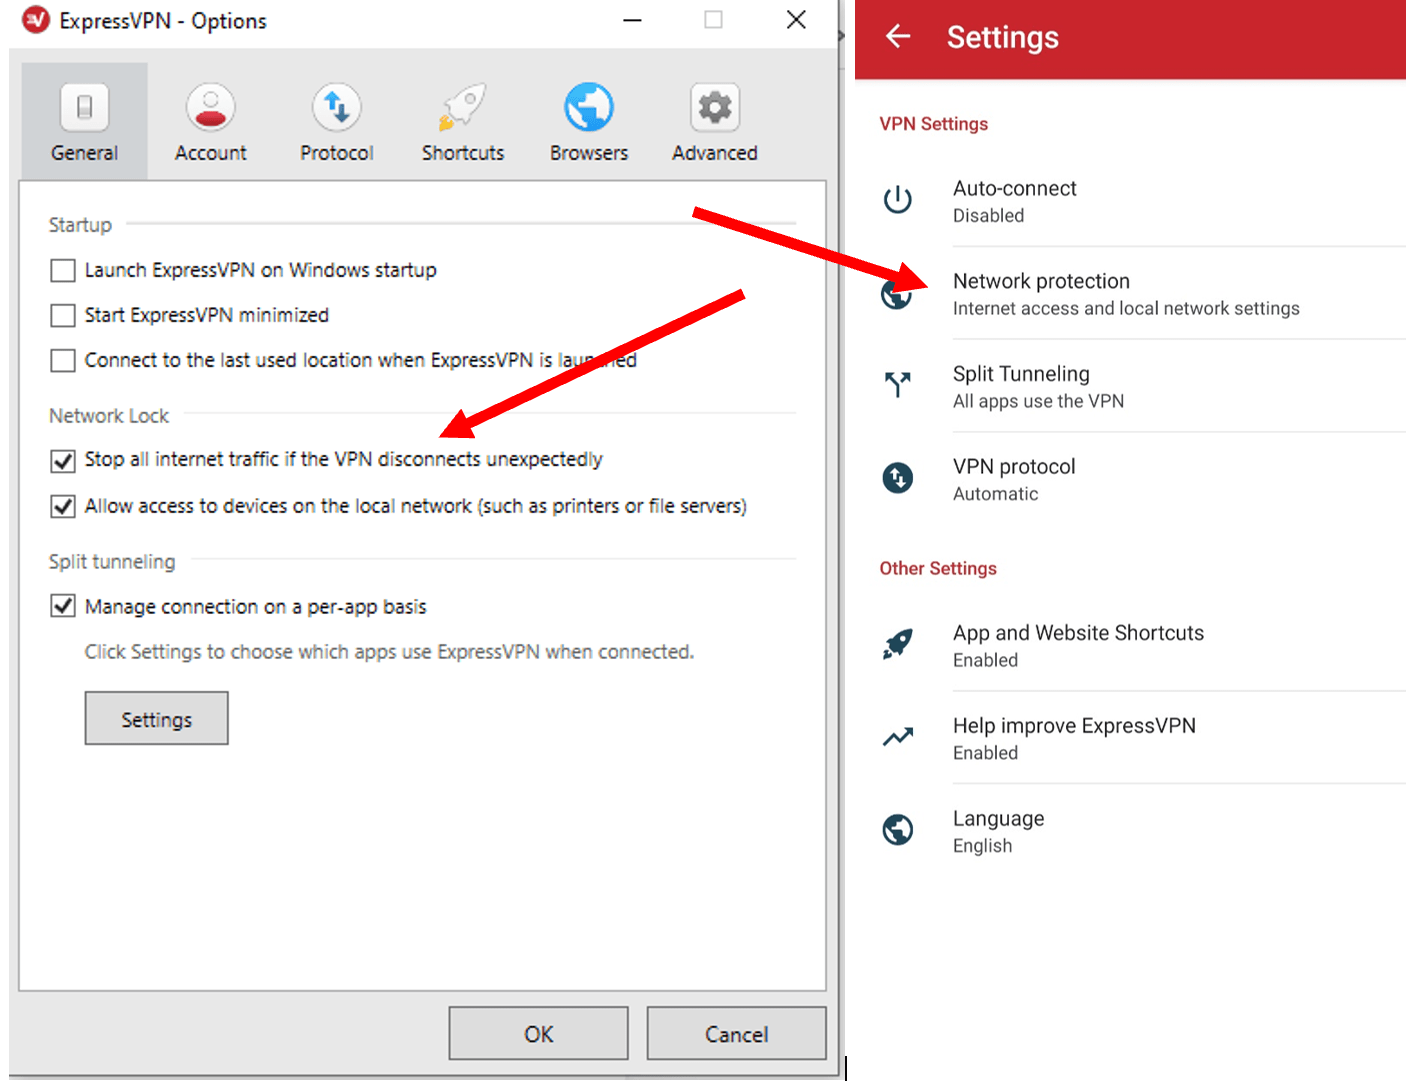 ExpressVPN settings interface